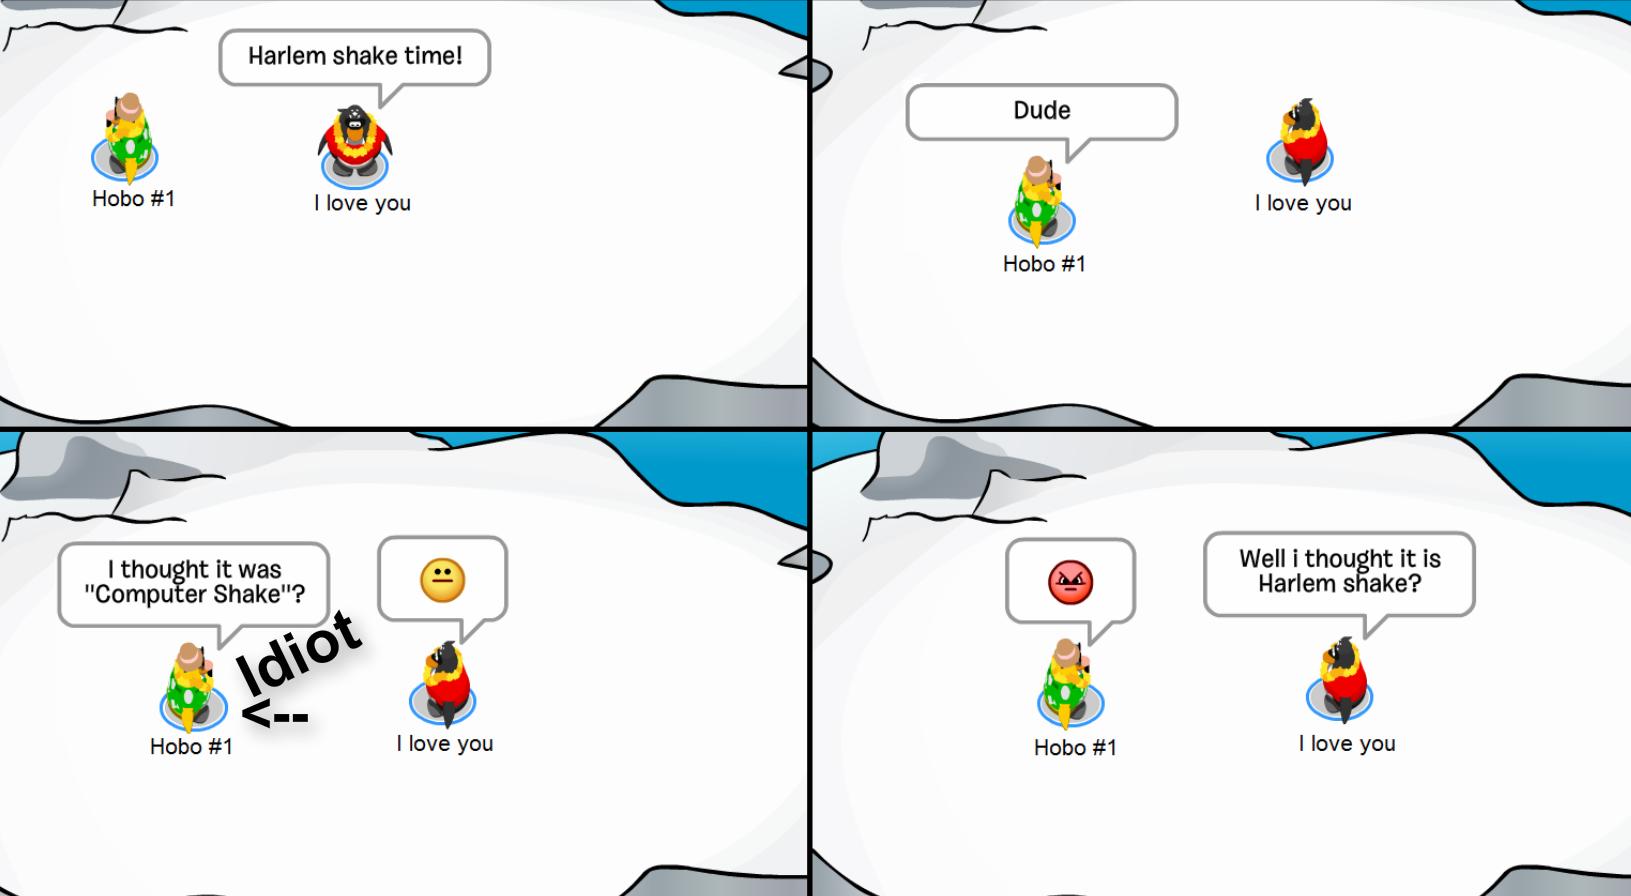 Club Penguin Memes: Computer Shake! - Episode 5